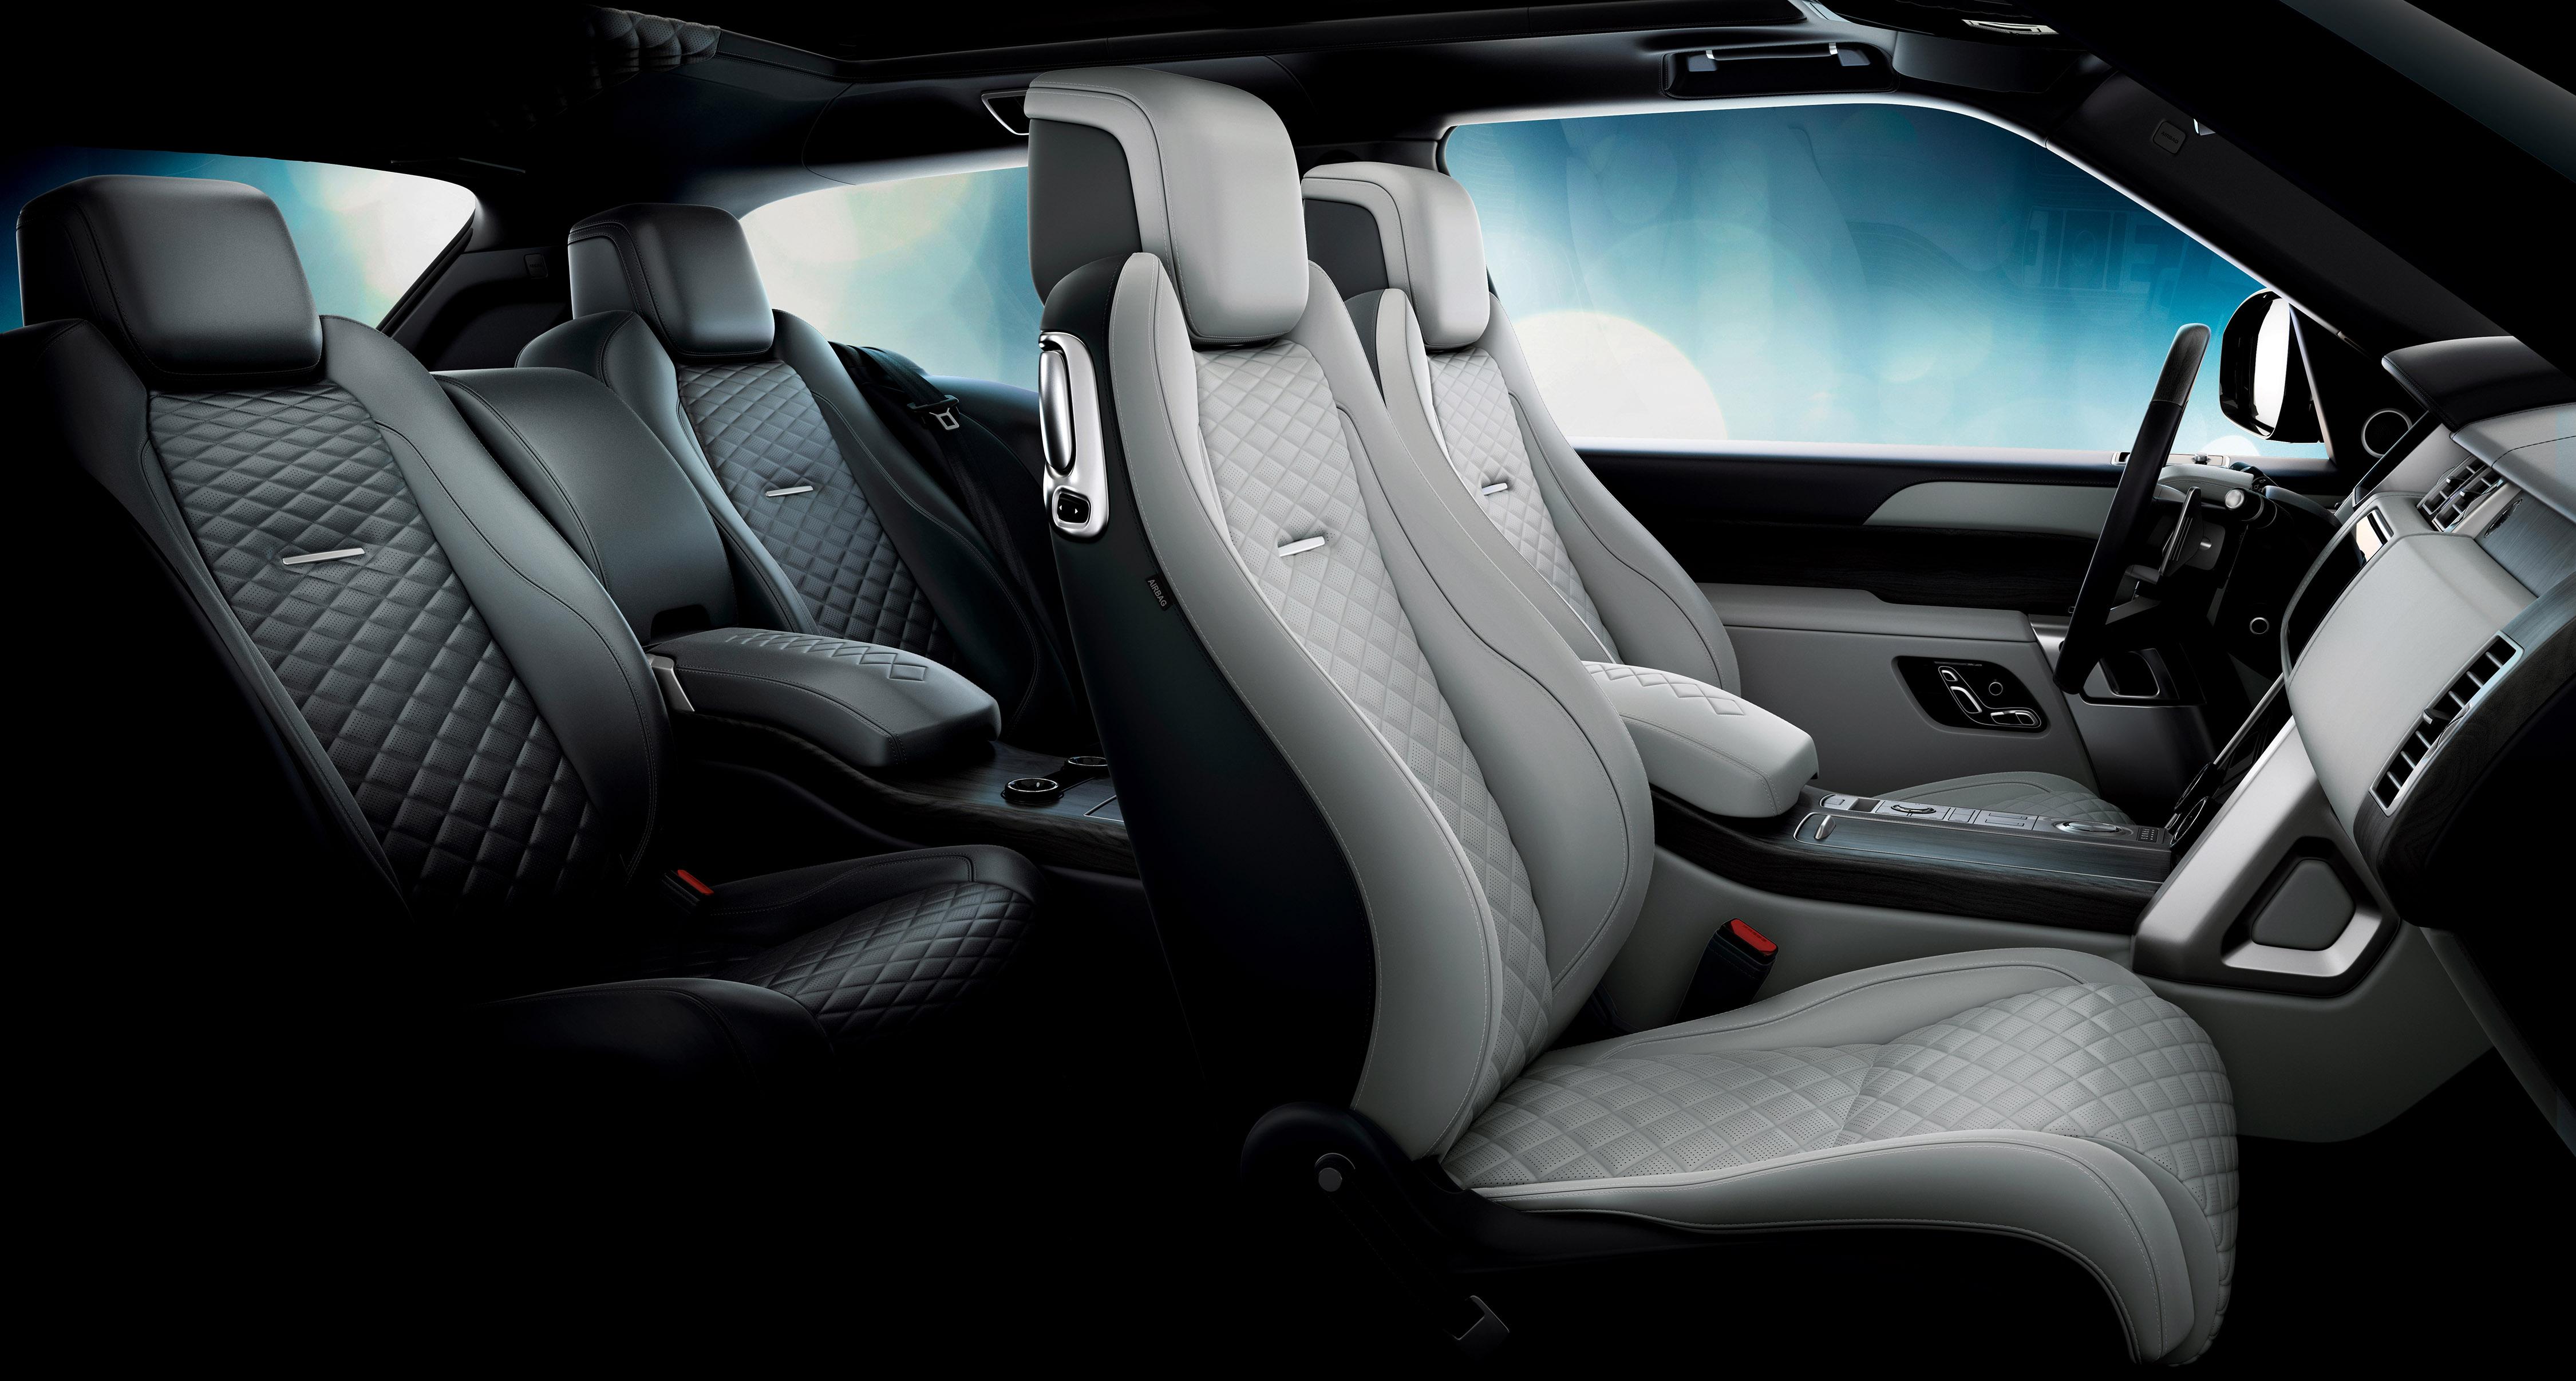 273746 08 range rover sv coupe d36183 original 1519909260